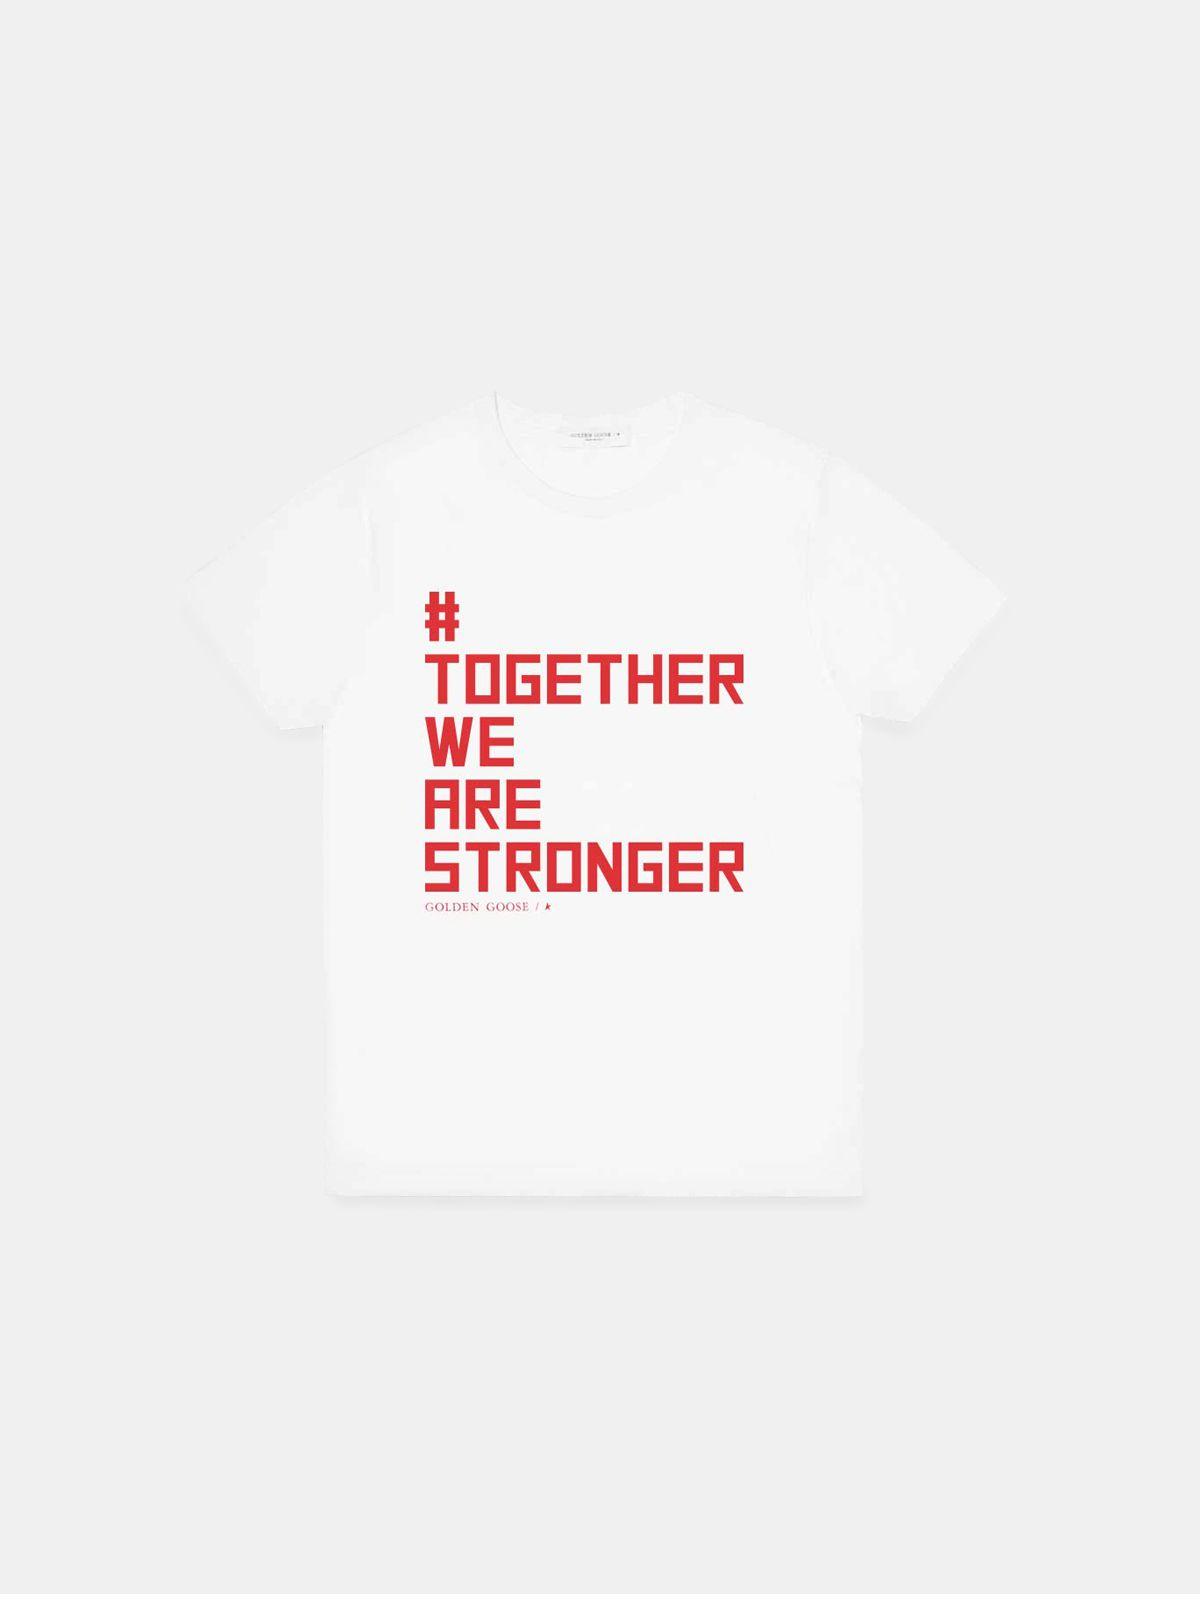 Golden Goose - T-shirt #TogetherWeAreStronger in